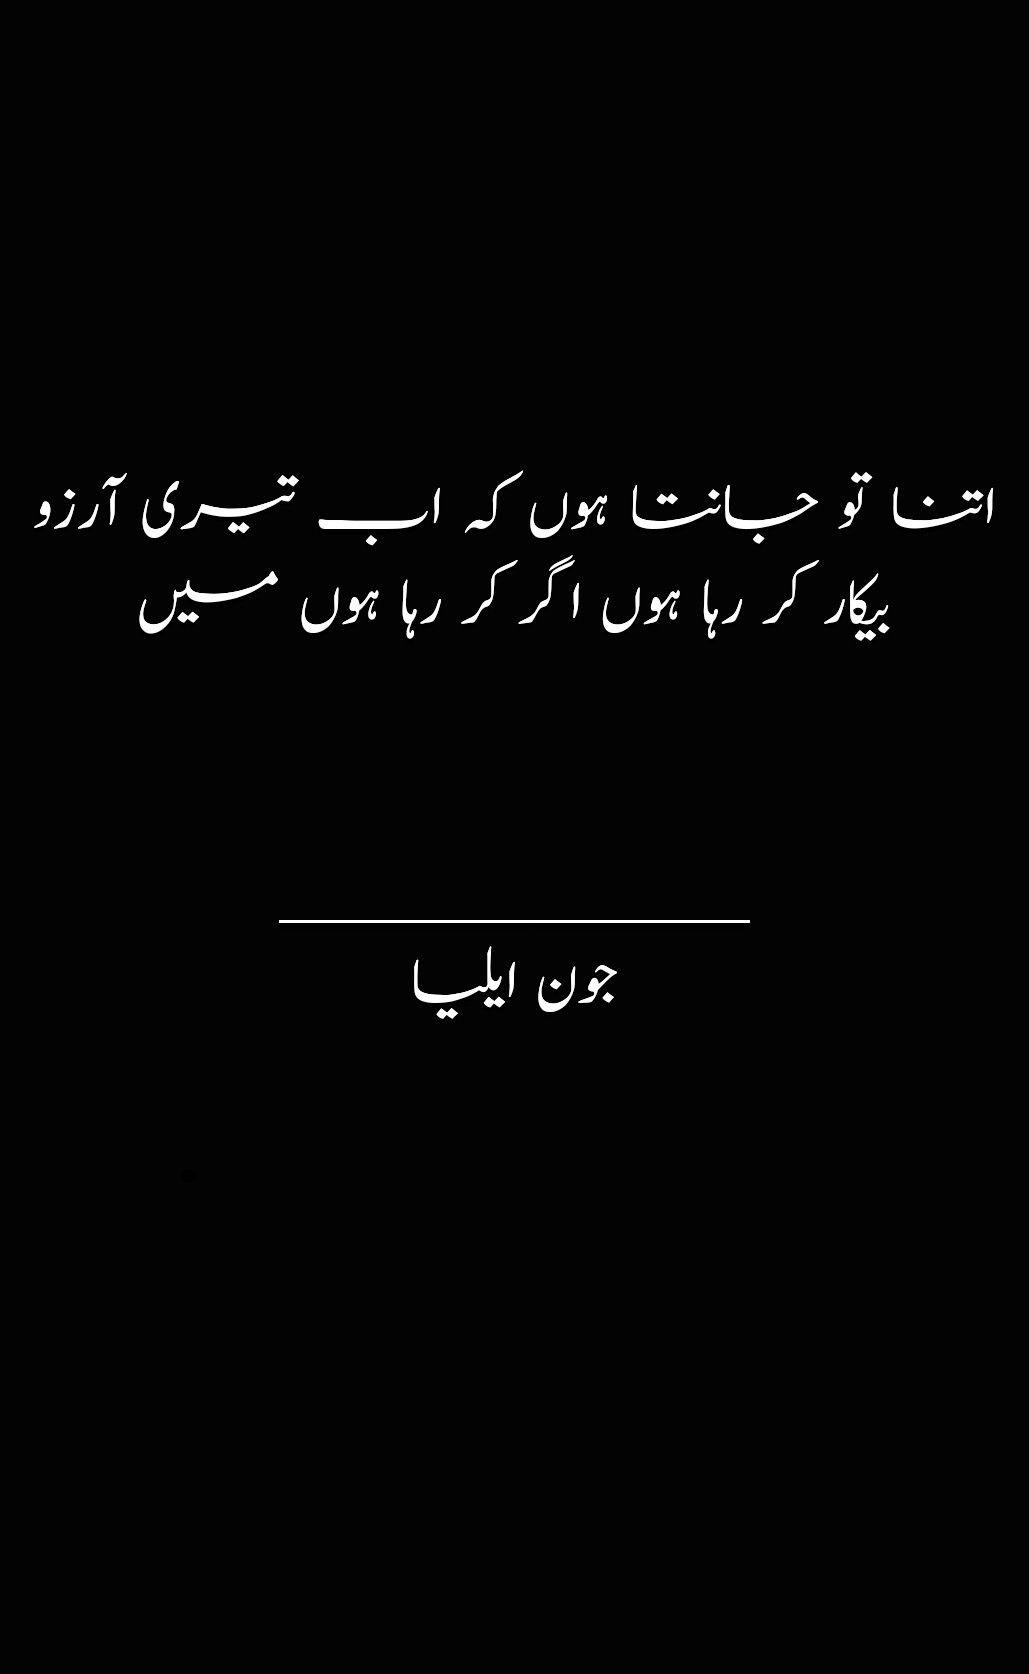 John Elia Poetry Image By Sunny Shaikh On Urdu Quote